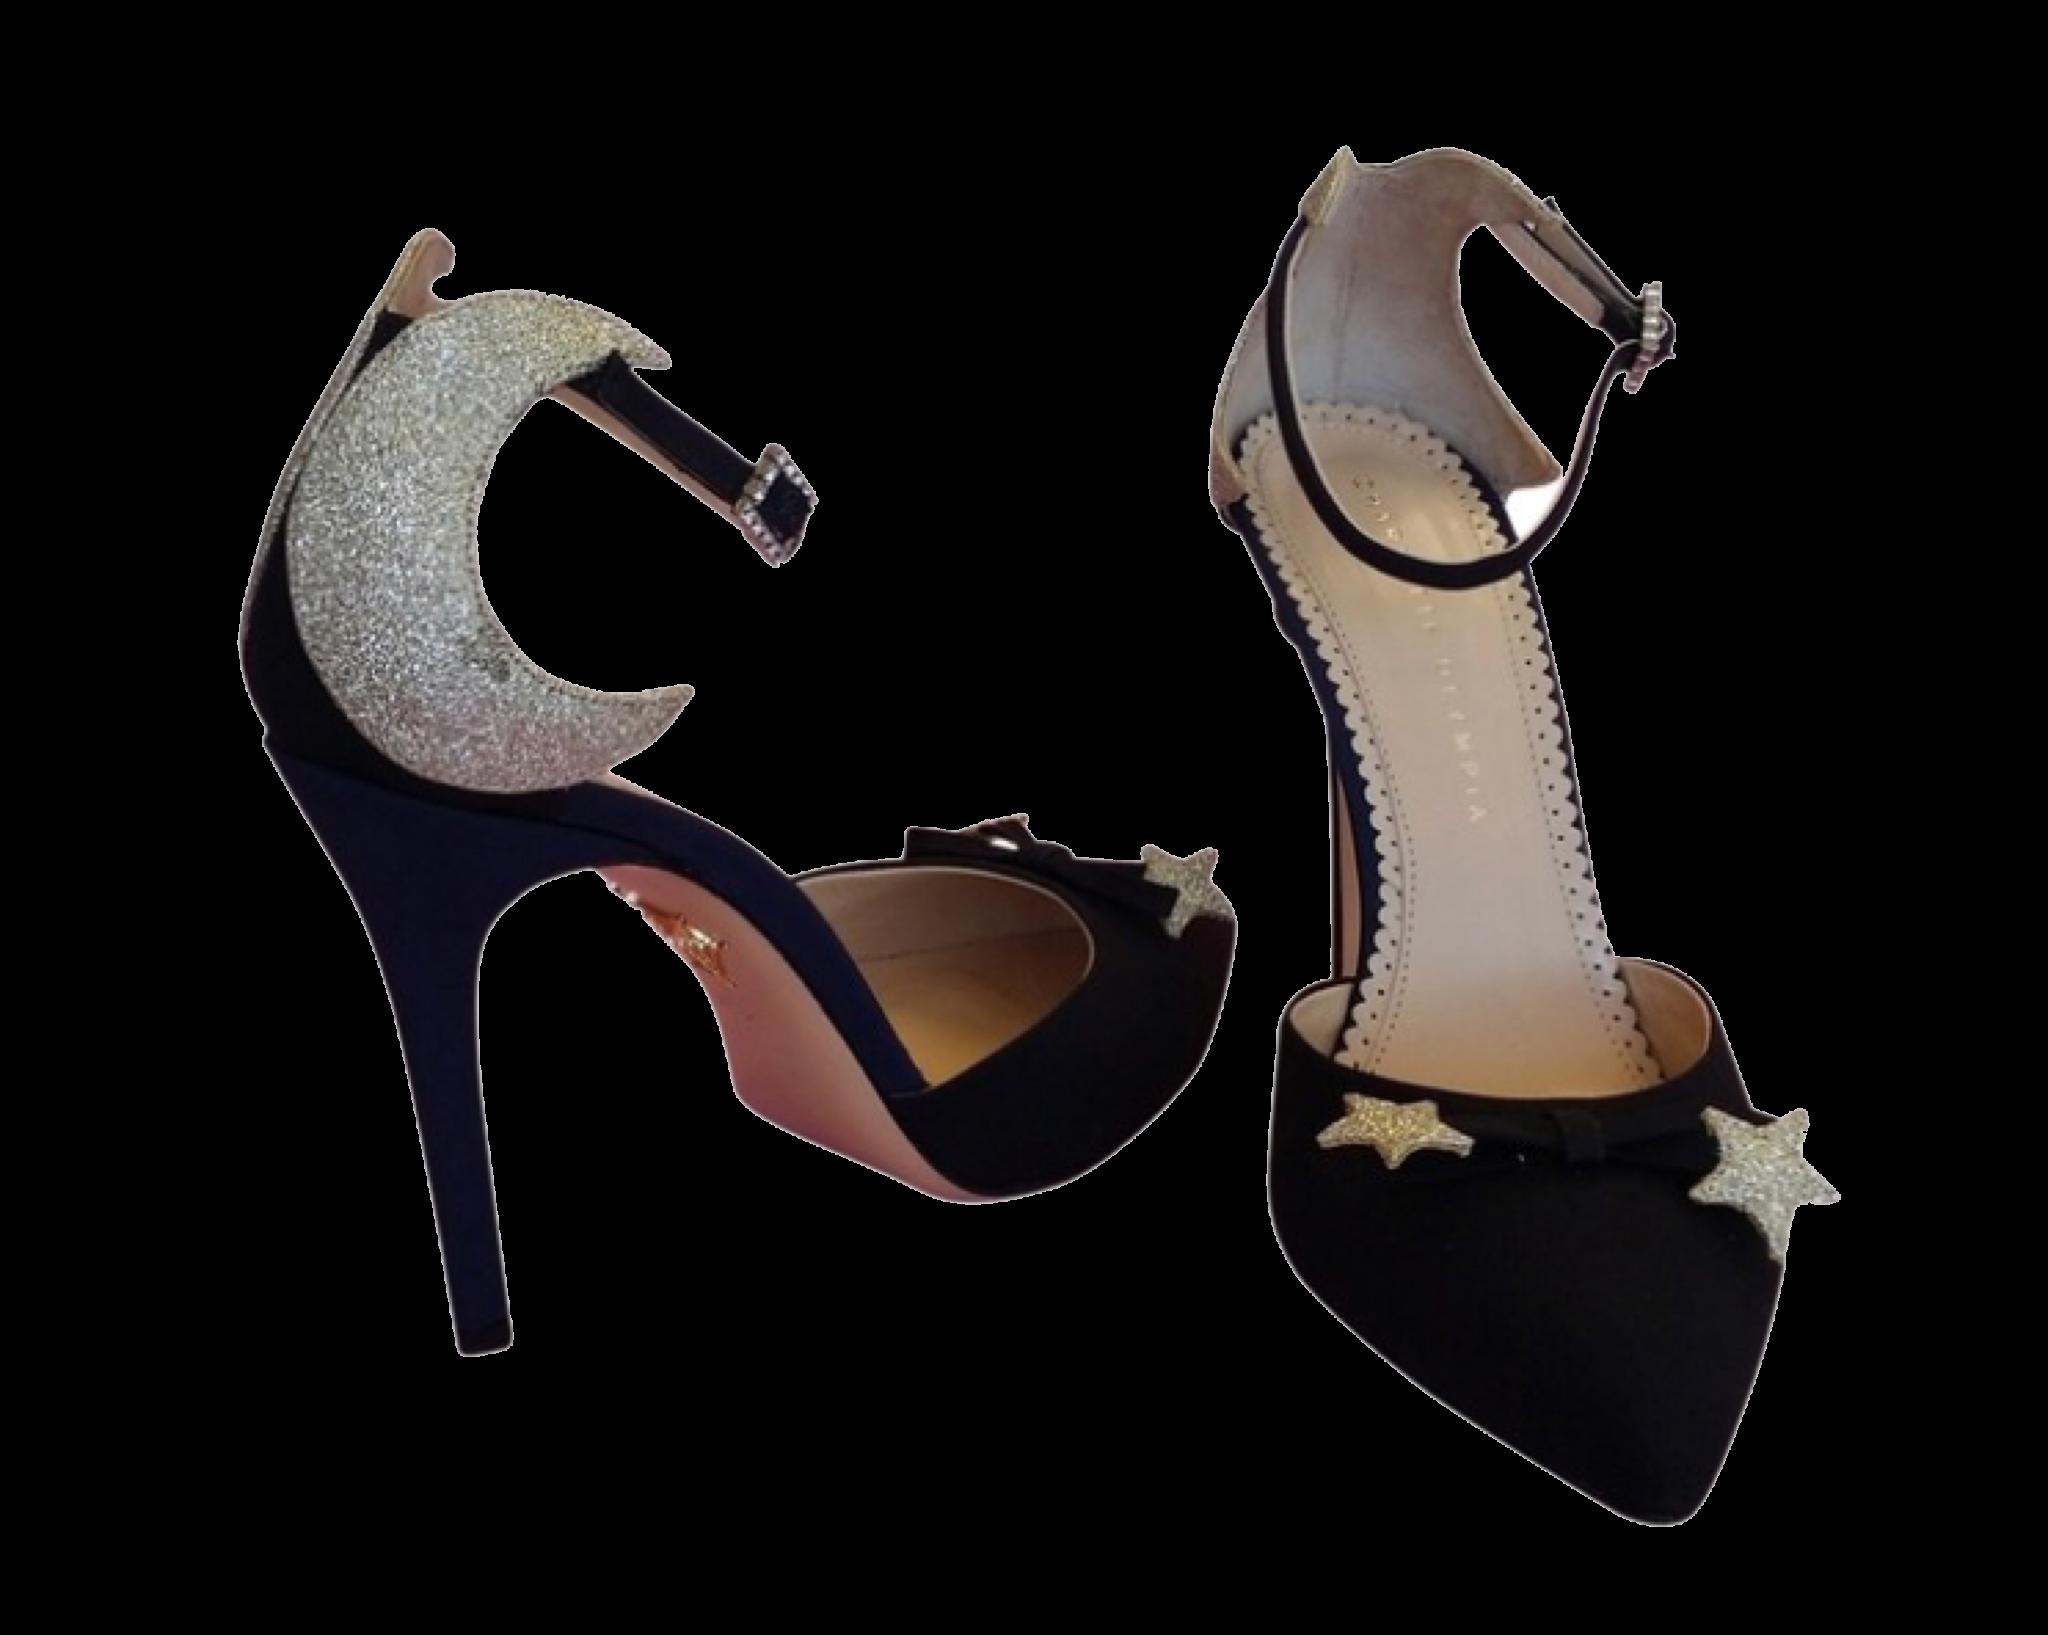 Black Moon Heels Polyvore Moodboard Filler Black Pumps Heels Navy Pumps Gold Glitter Shoes